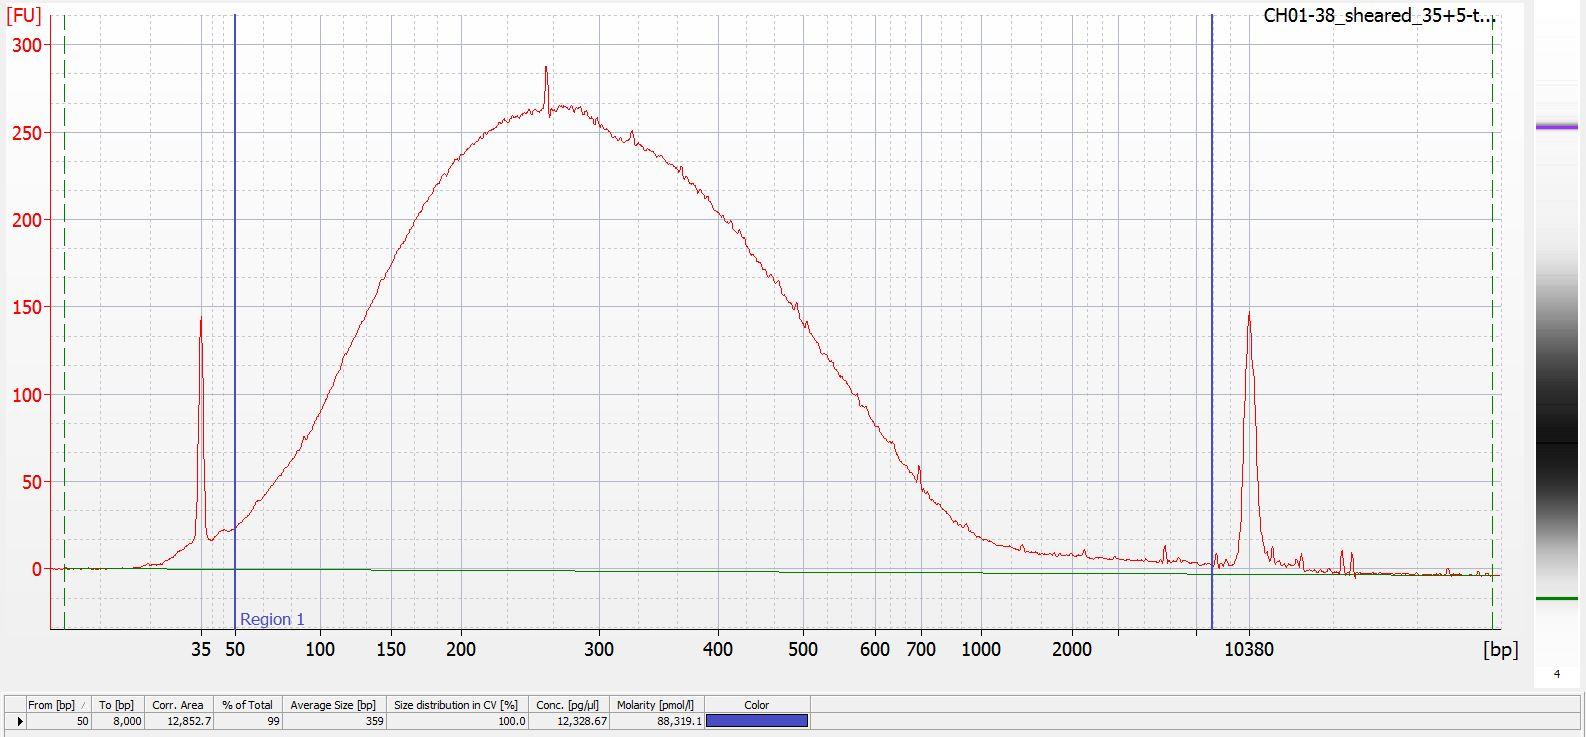 Sheared CH01-38 Bioanalyzer electropherogram